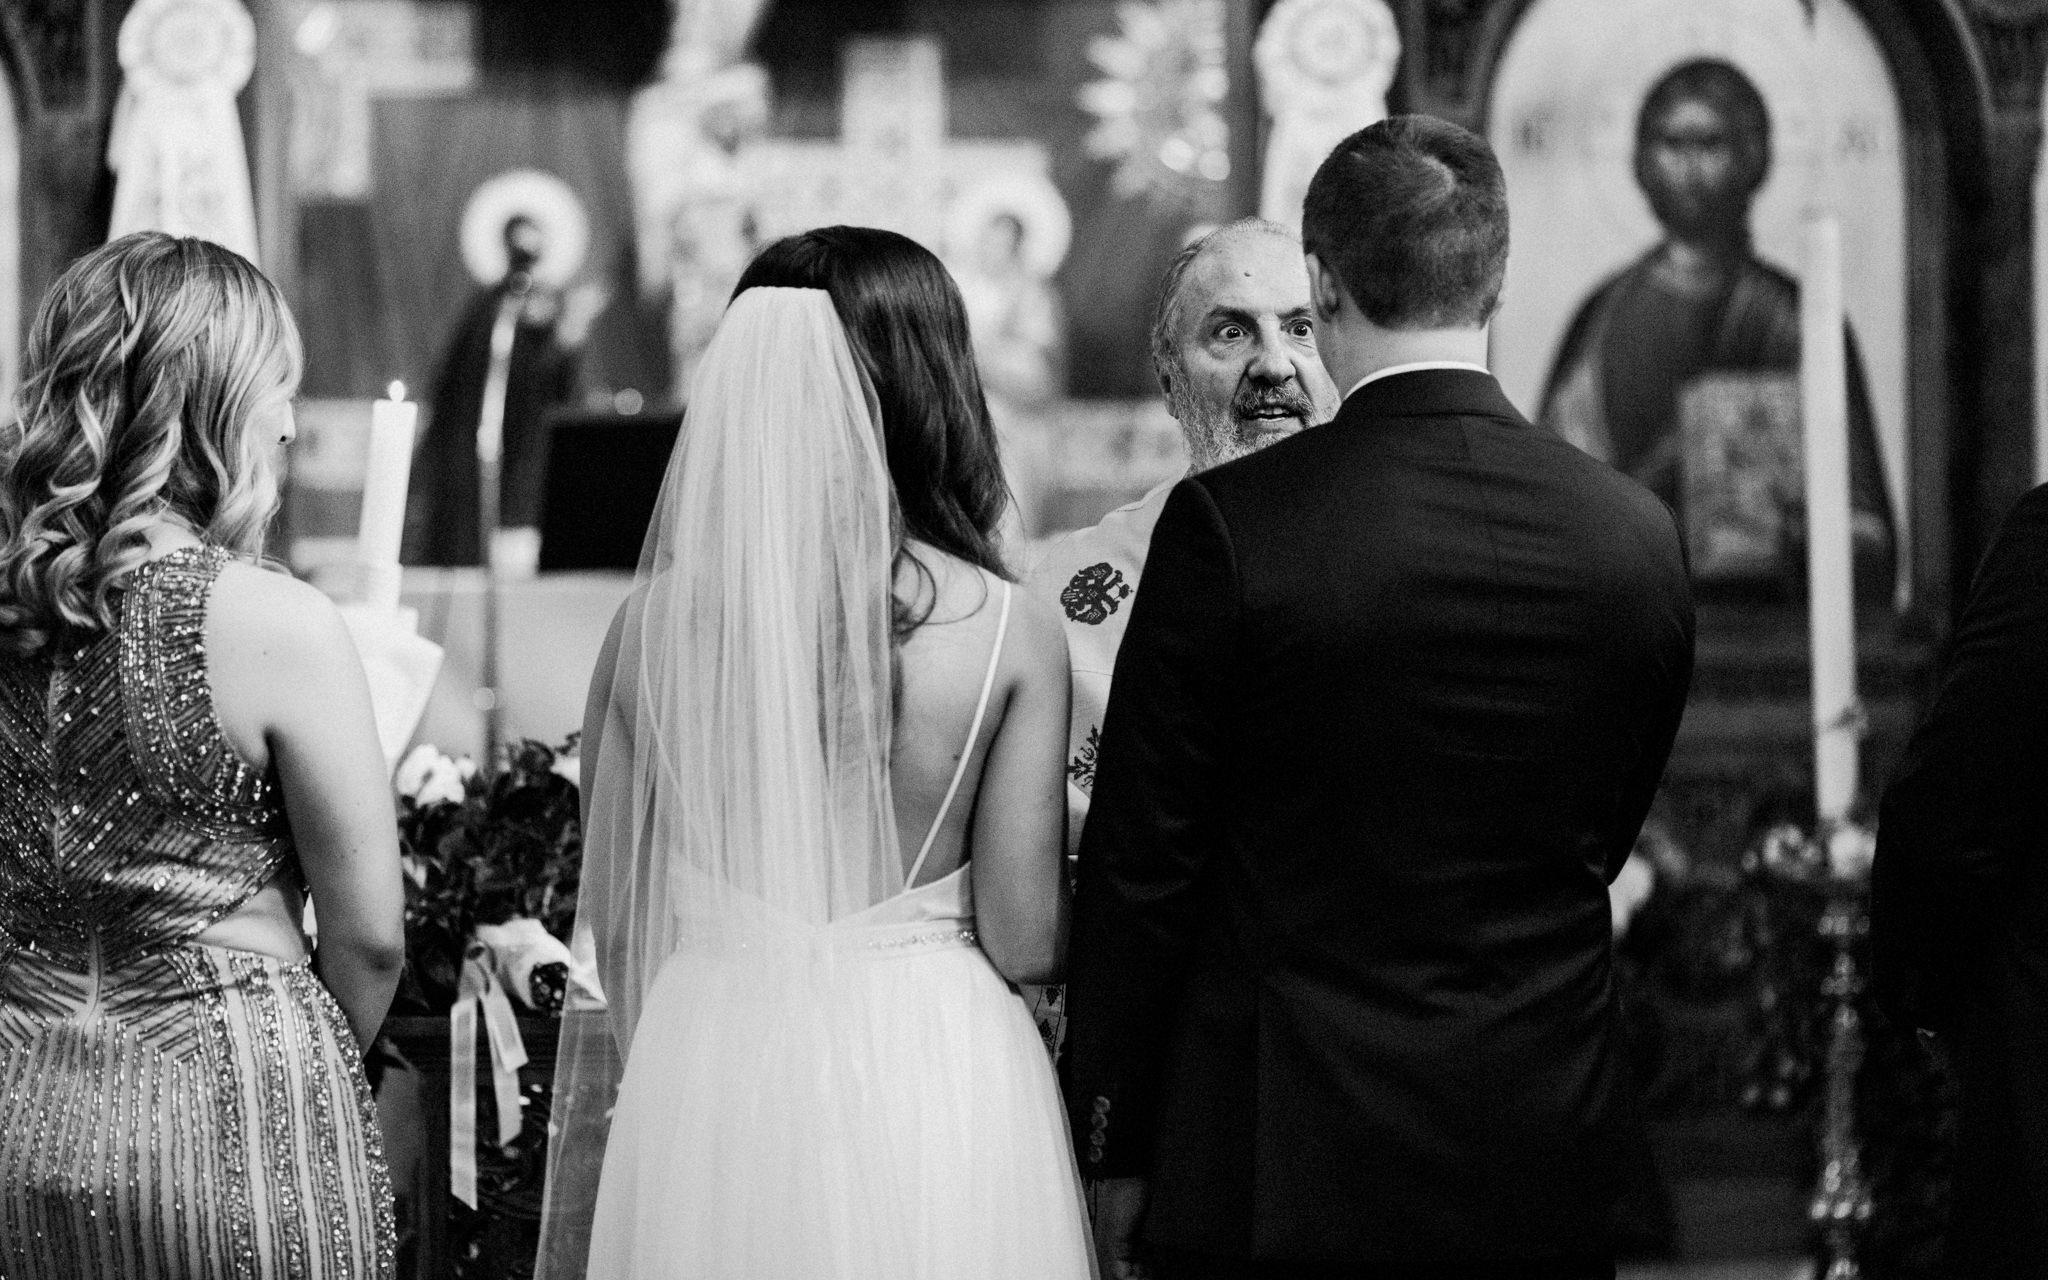 priest talks to bride and groom